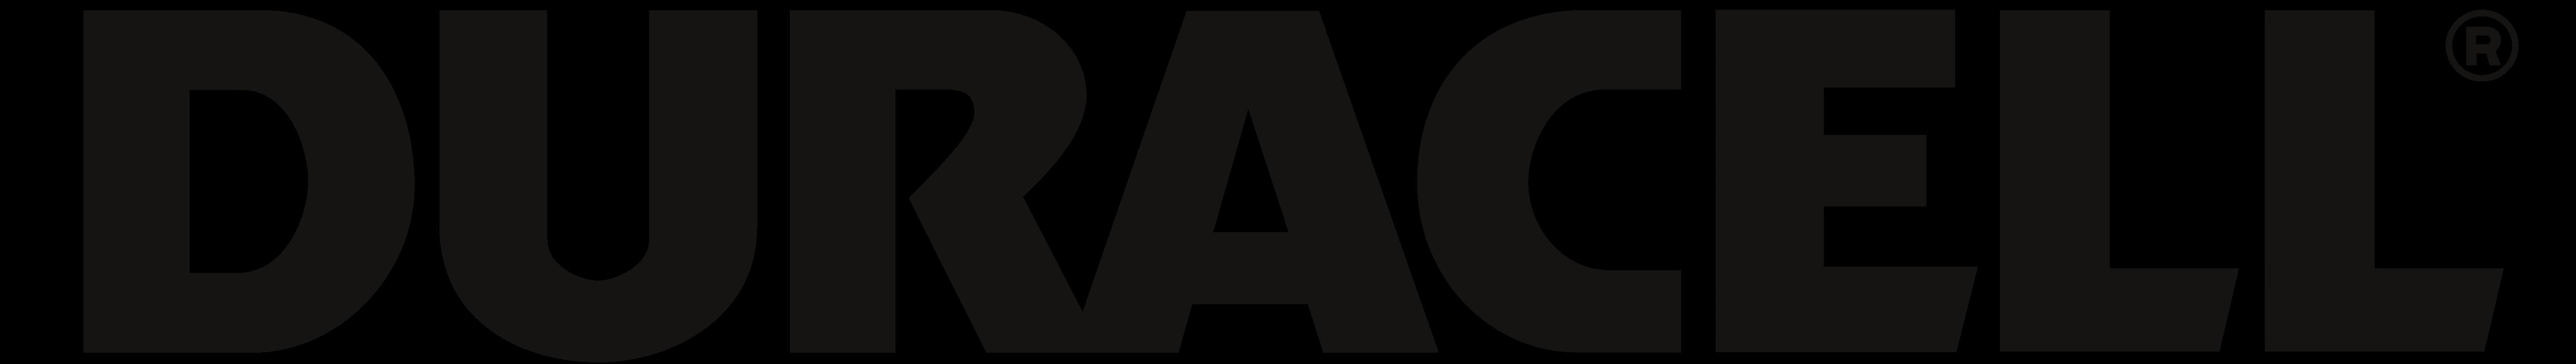 Duracell – Logos Download